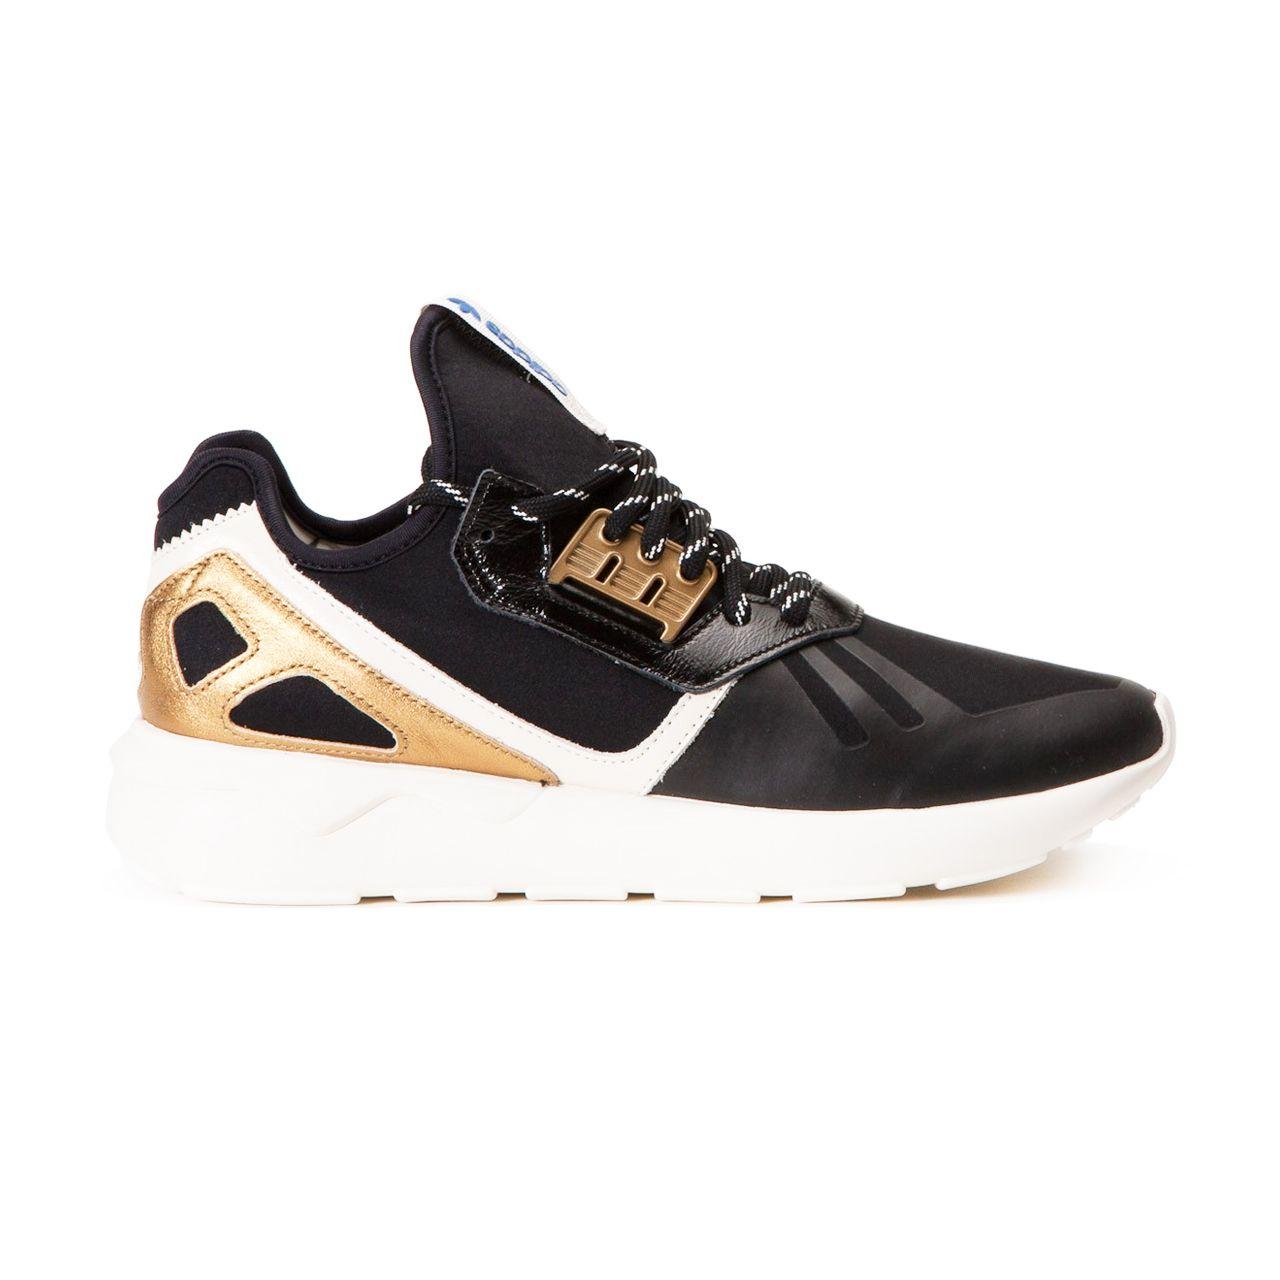 Sneakersnerodal Trendy marchio uomo Adidas Tubular Runner per 8m0wvNn